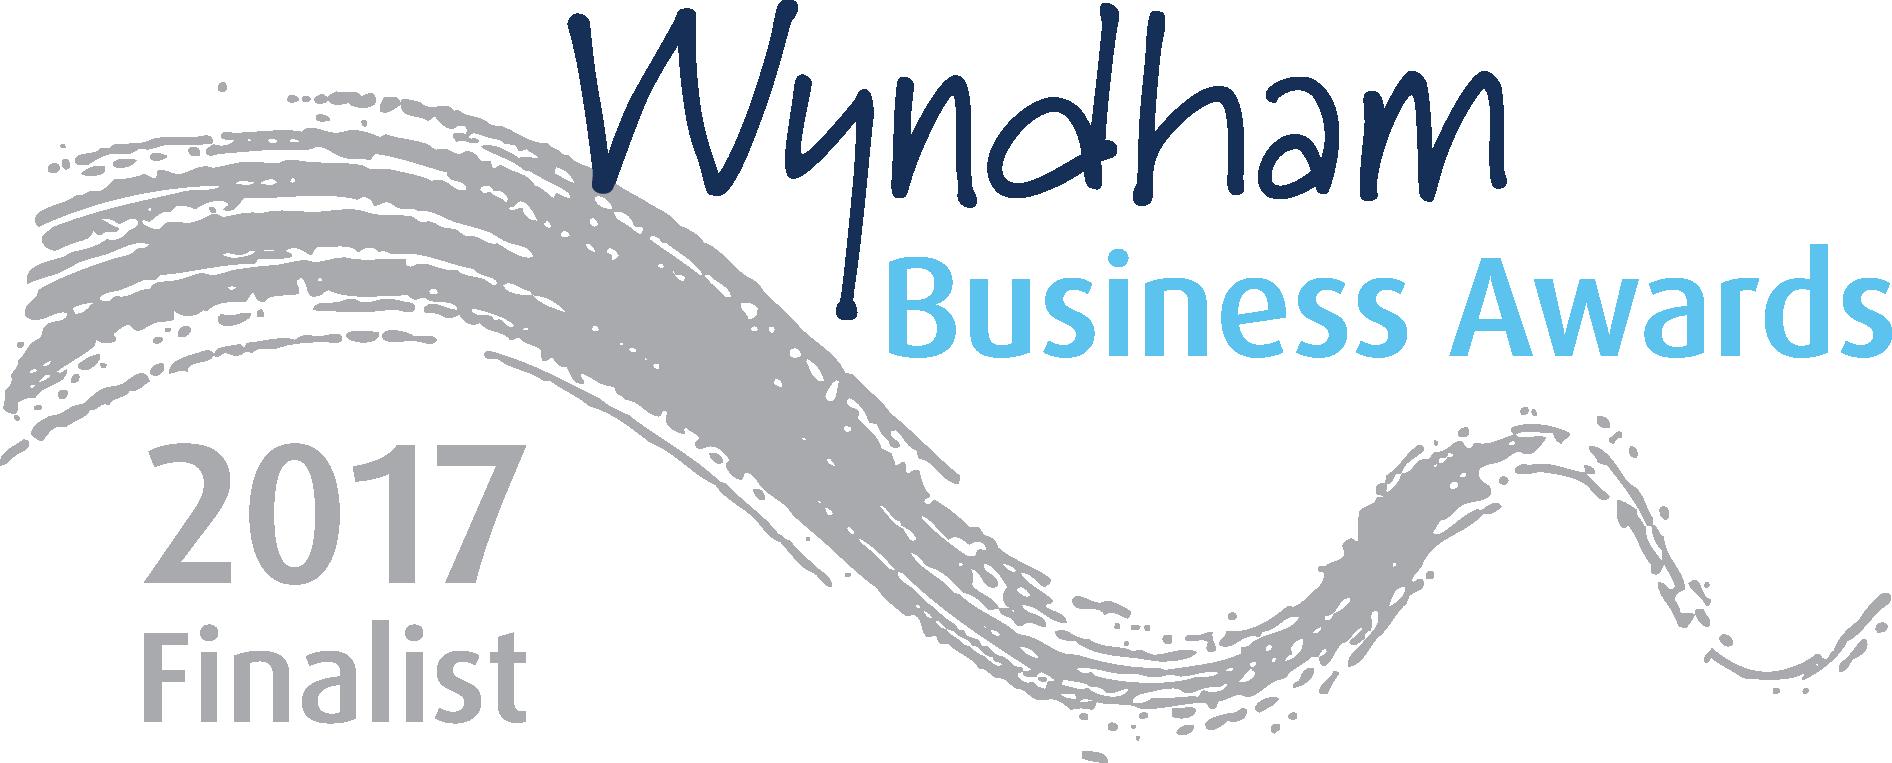 wyndham-business-awards-logo-2017.png